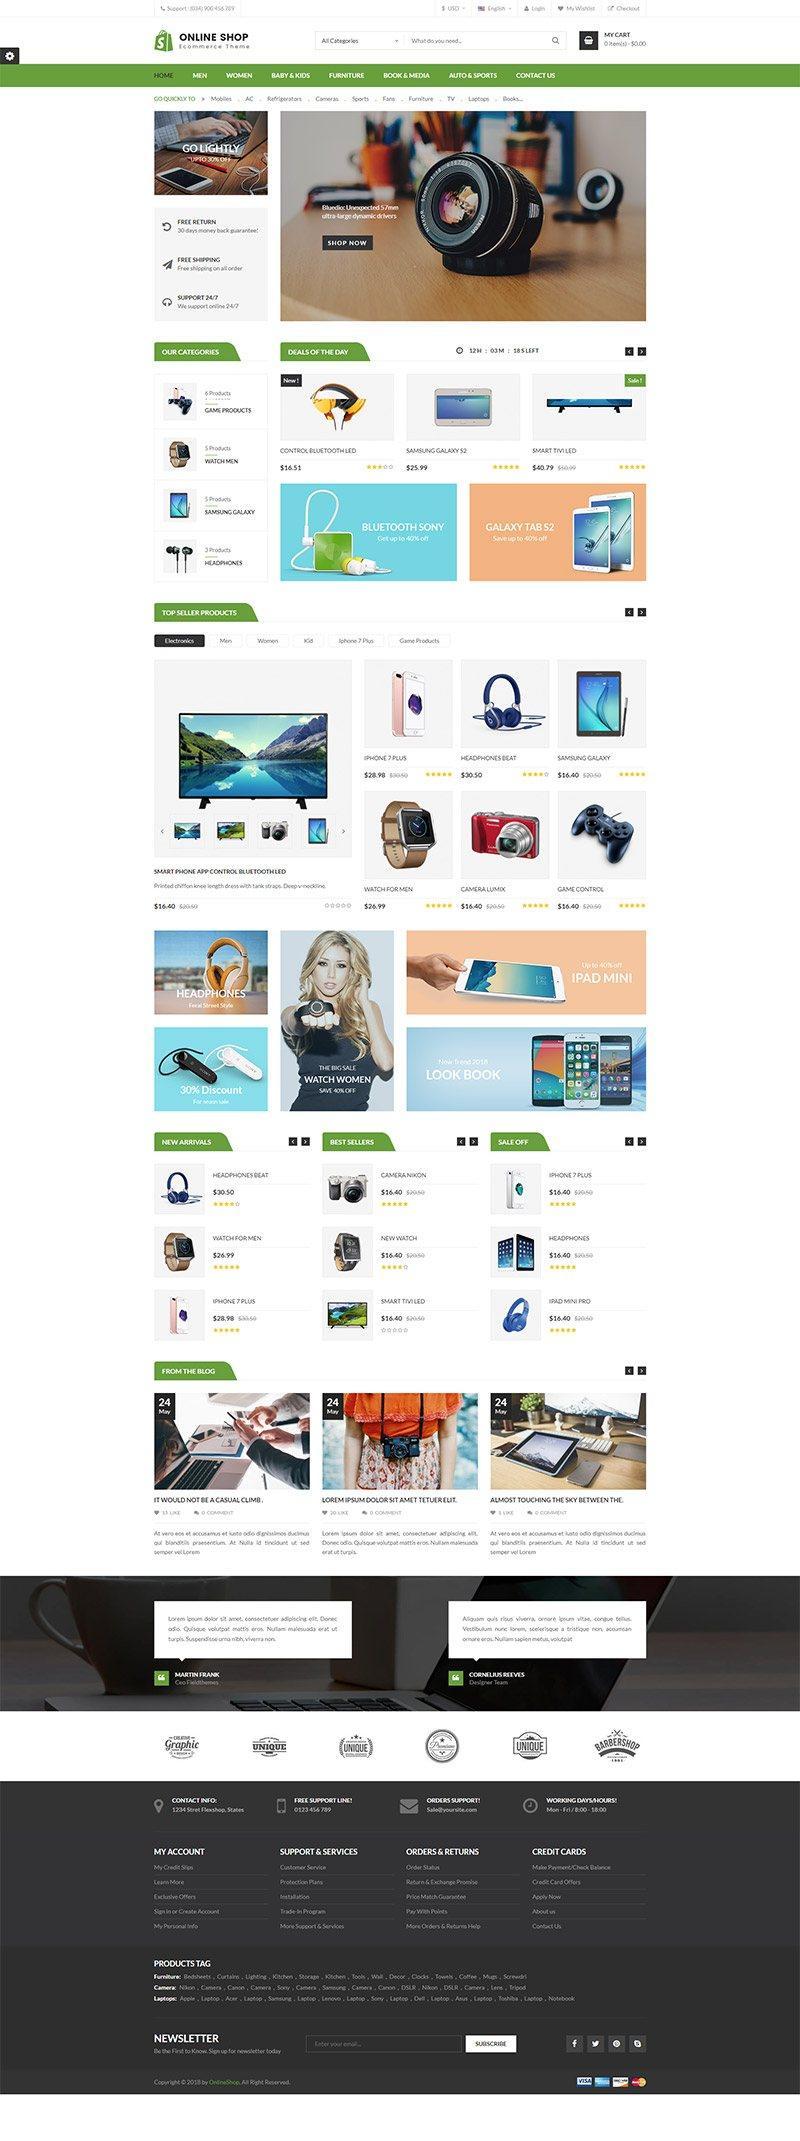 Giao-dien-website-thuong-mai-dien-tu-online-shop